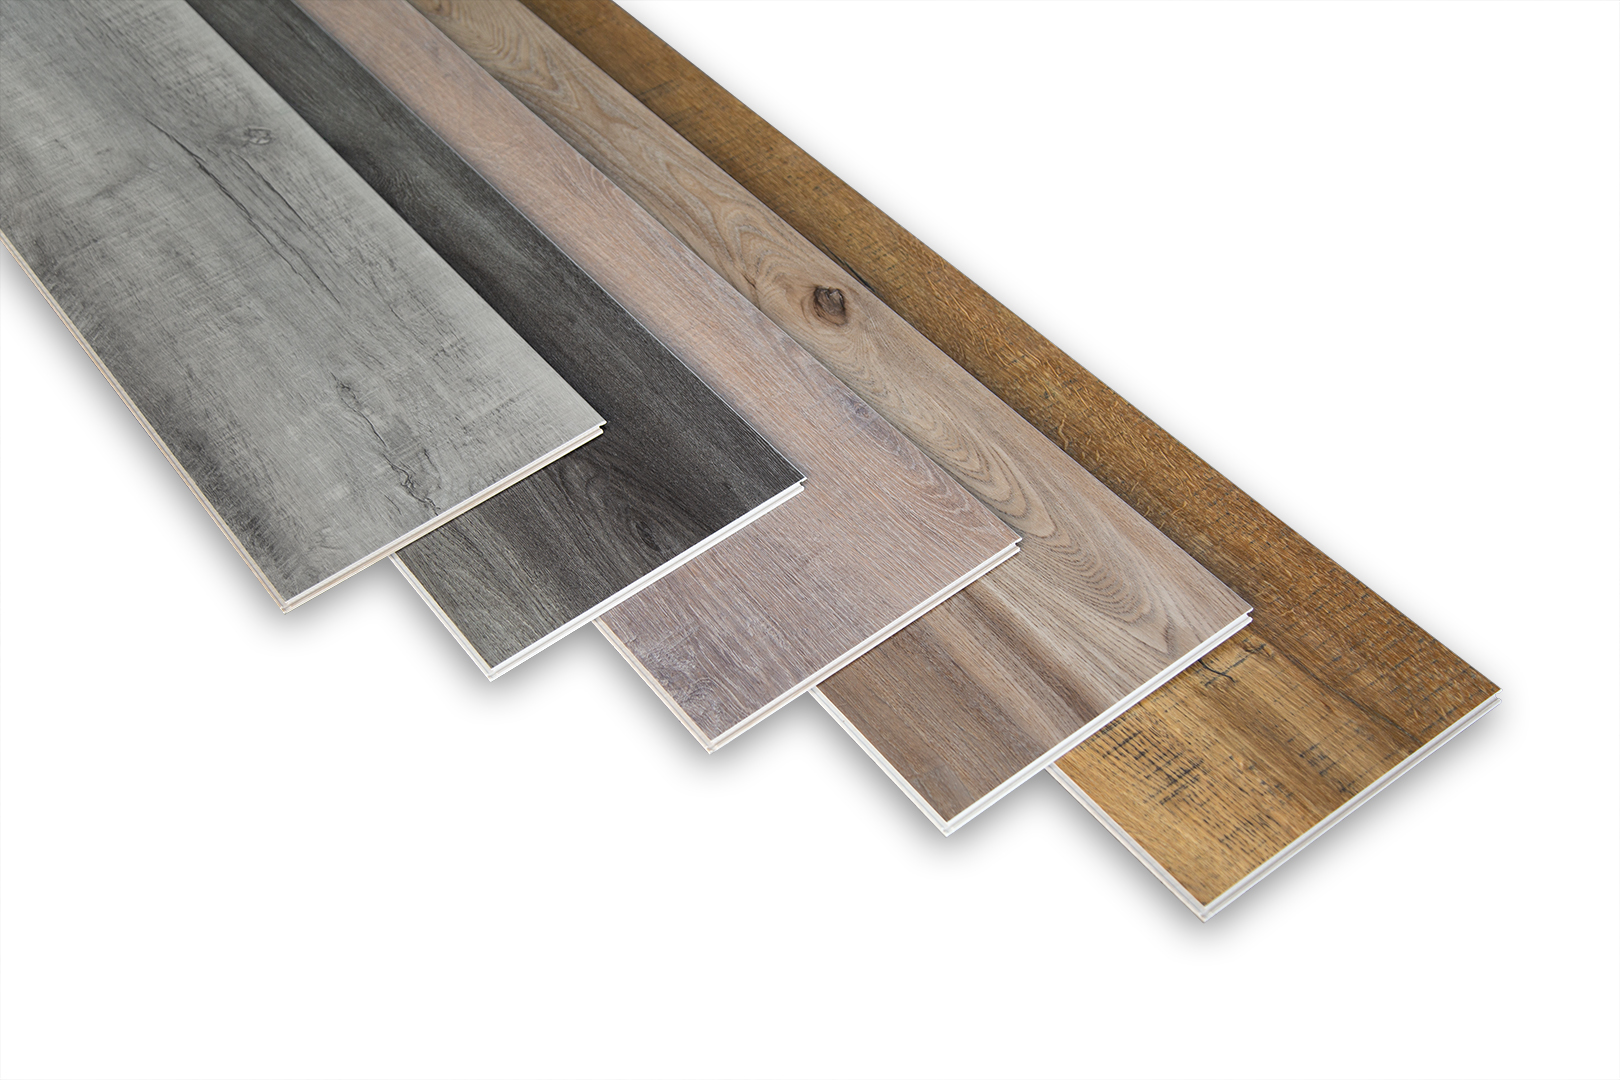 SPC Vinylboden | I4F Klick | Öko | Perfect | 20cm | PS Muster